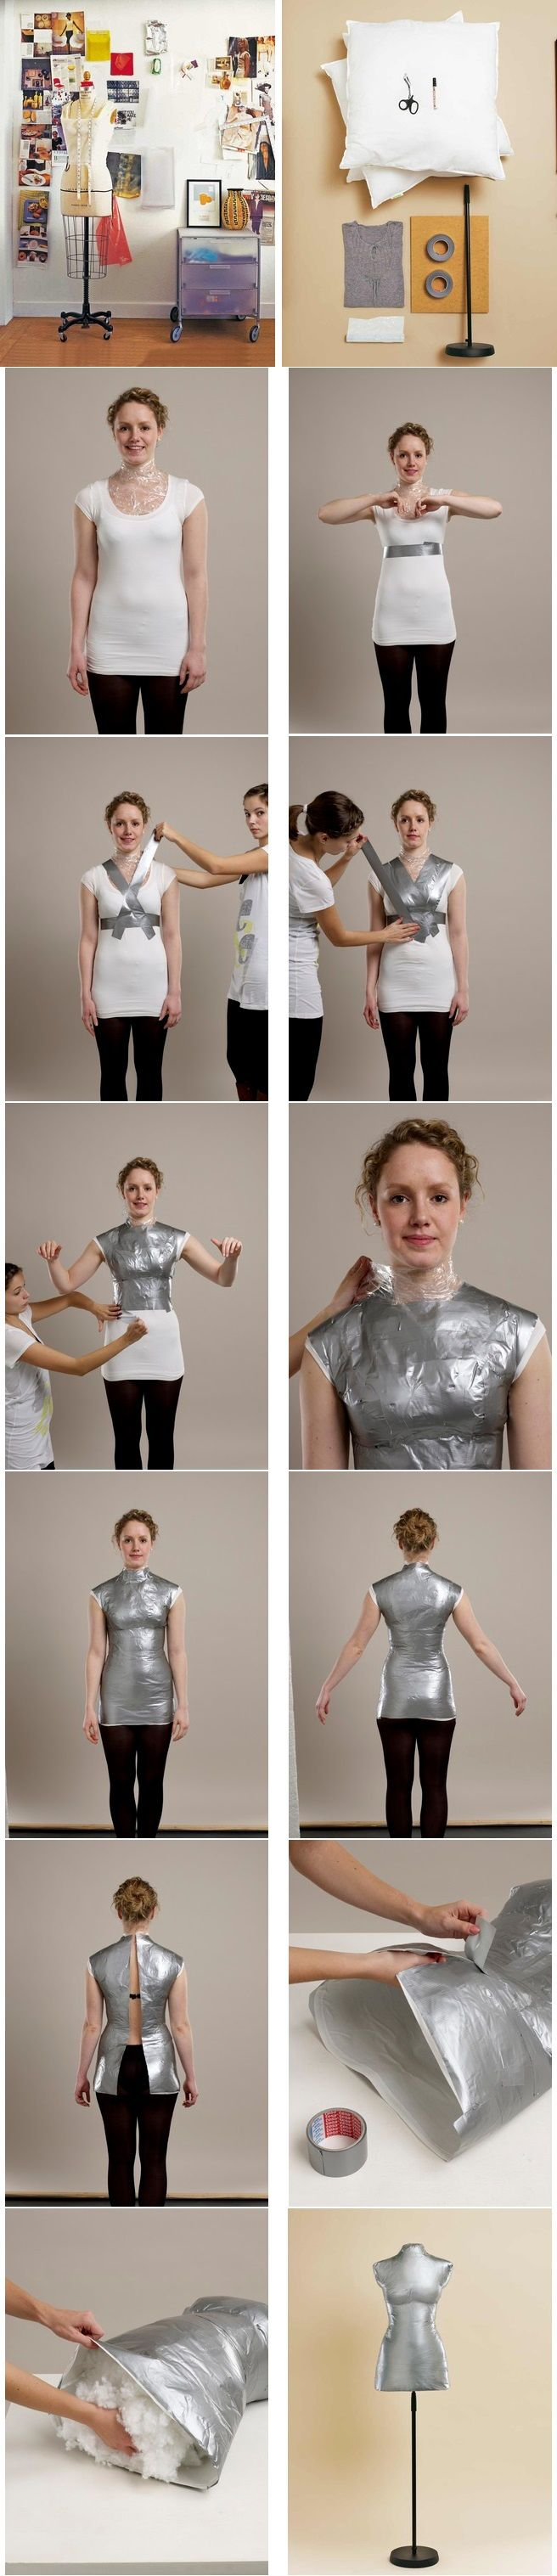 DIY – Vrac tutos coutures !   Ptimatcha